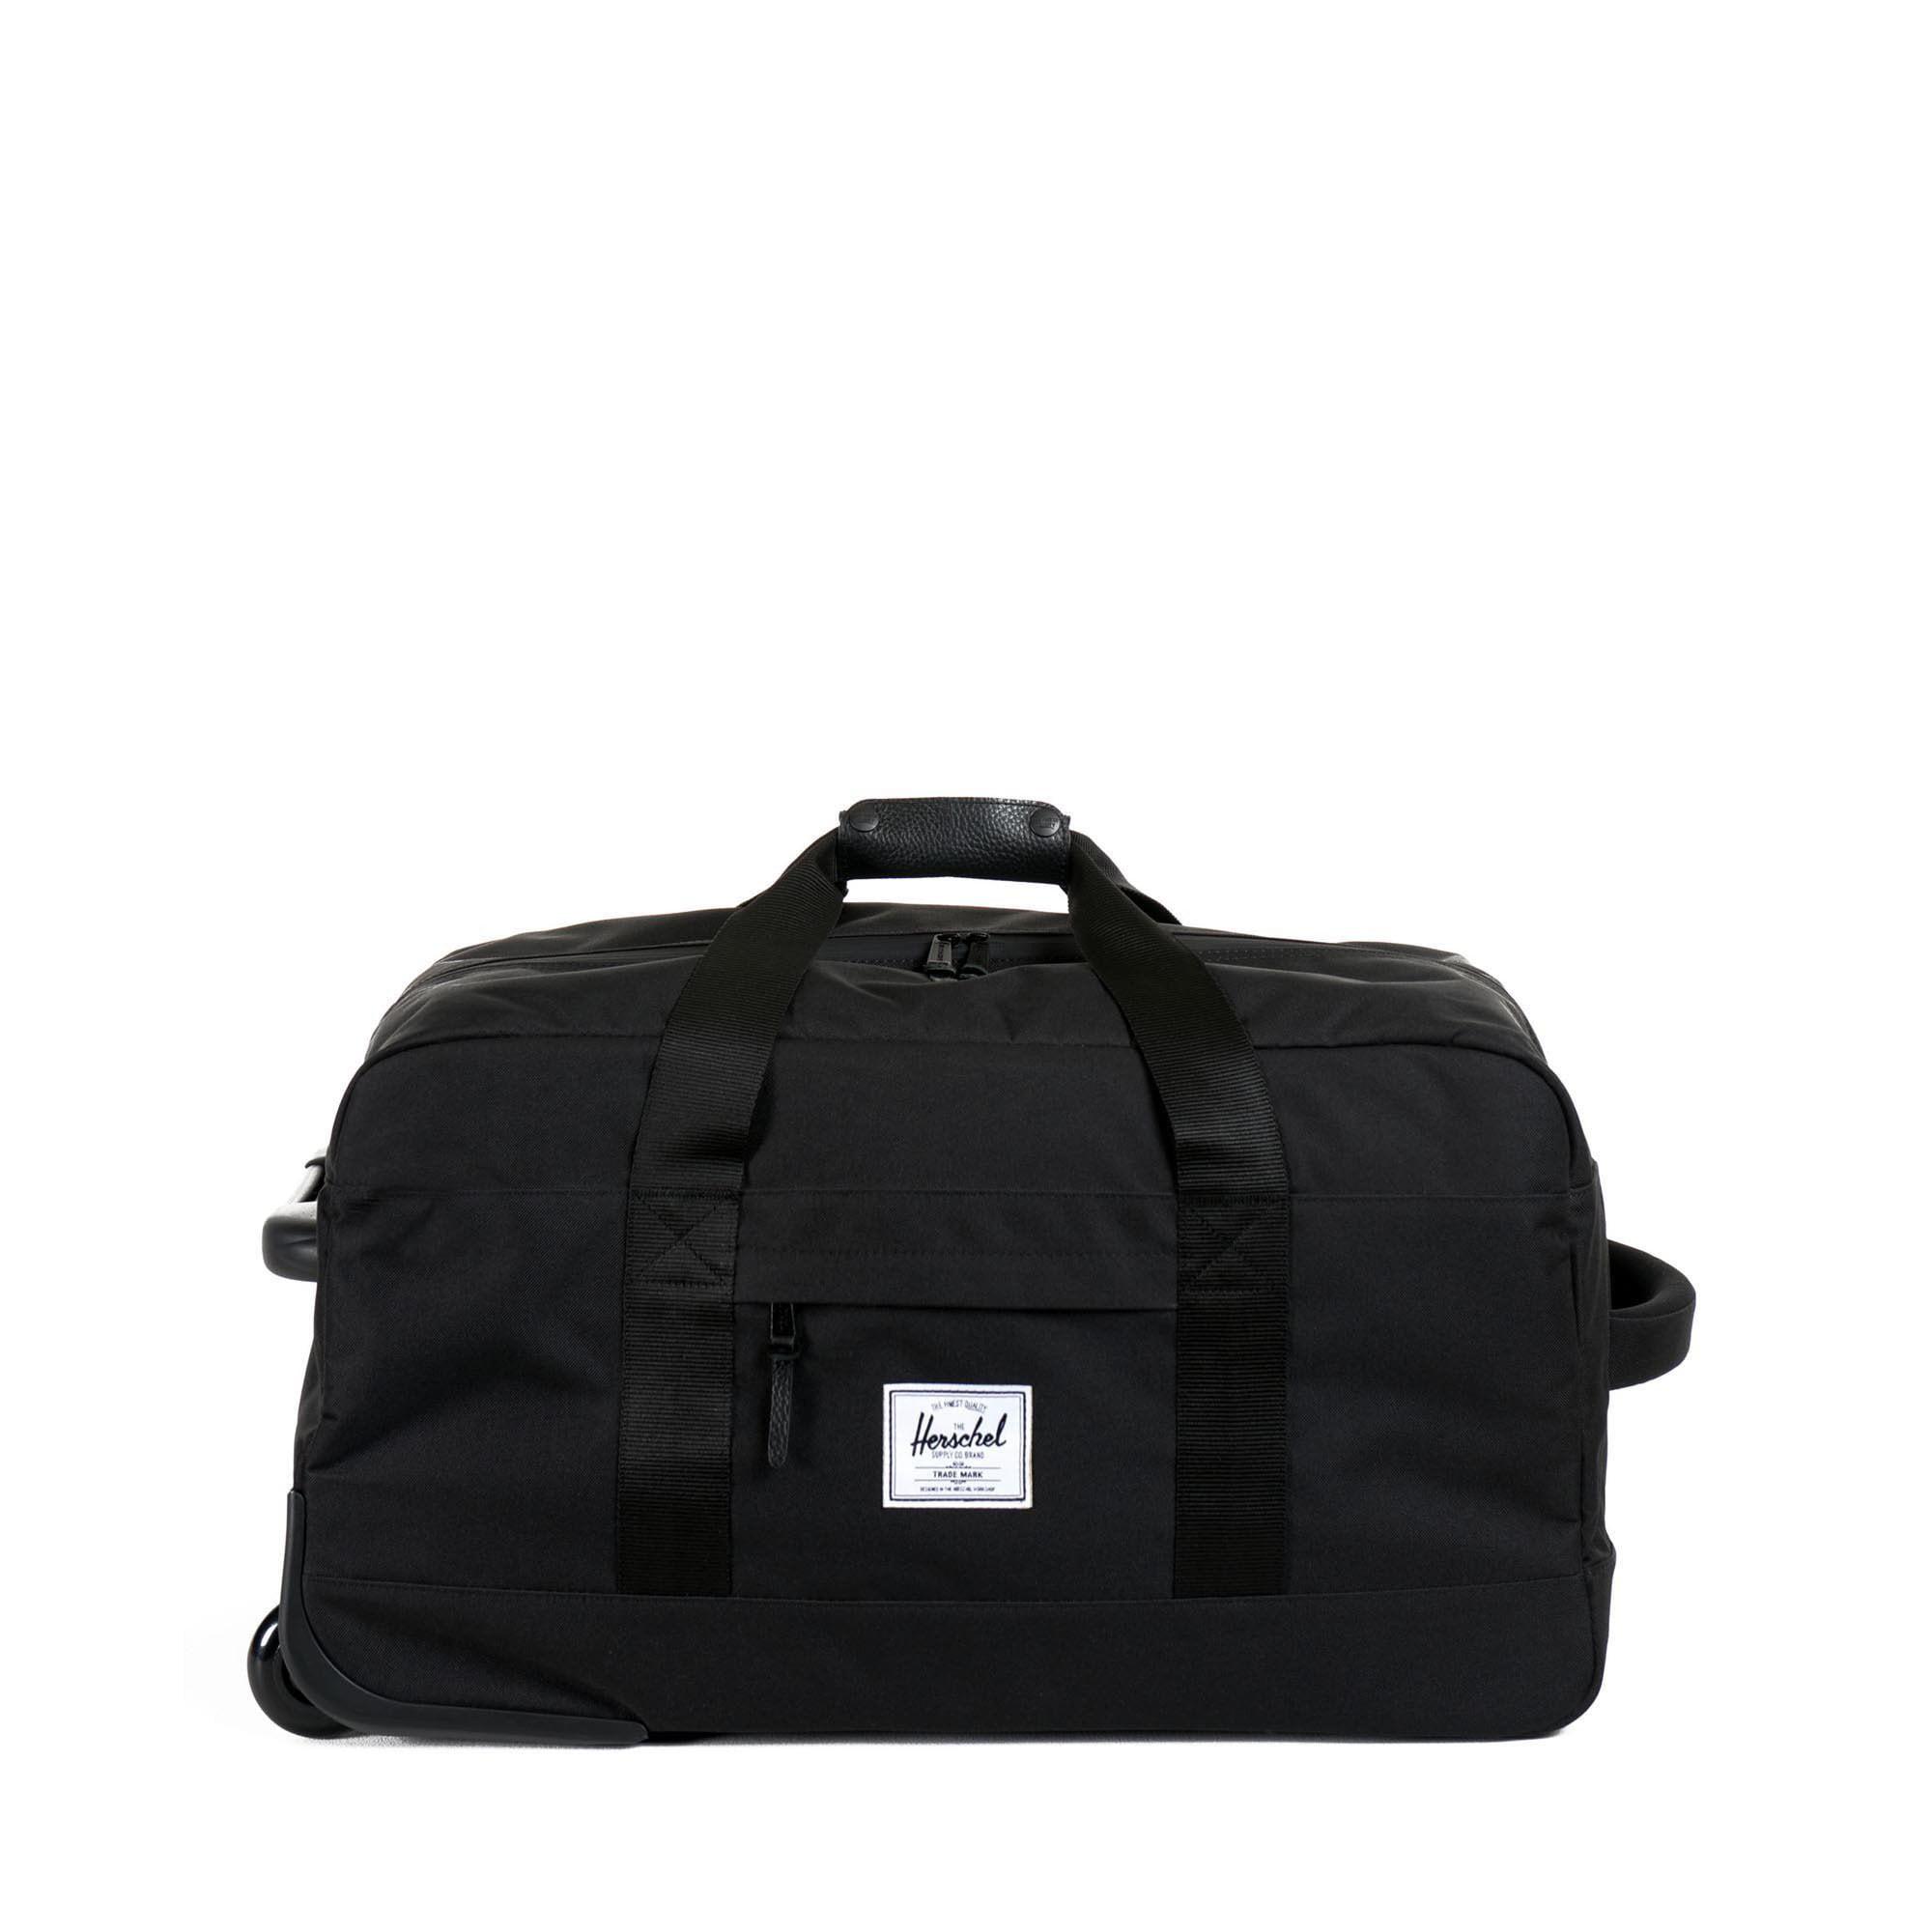 Herschel Outfitter Wheelie Duffle Bag Black One Size